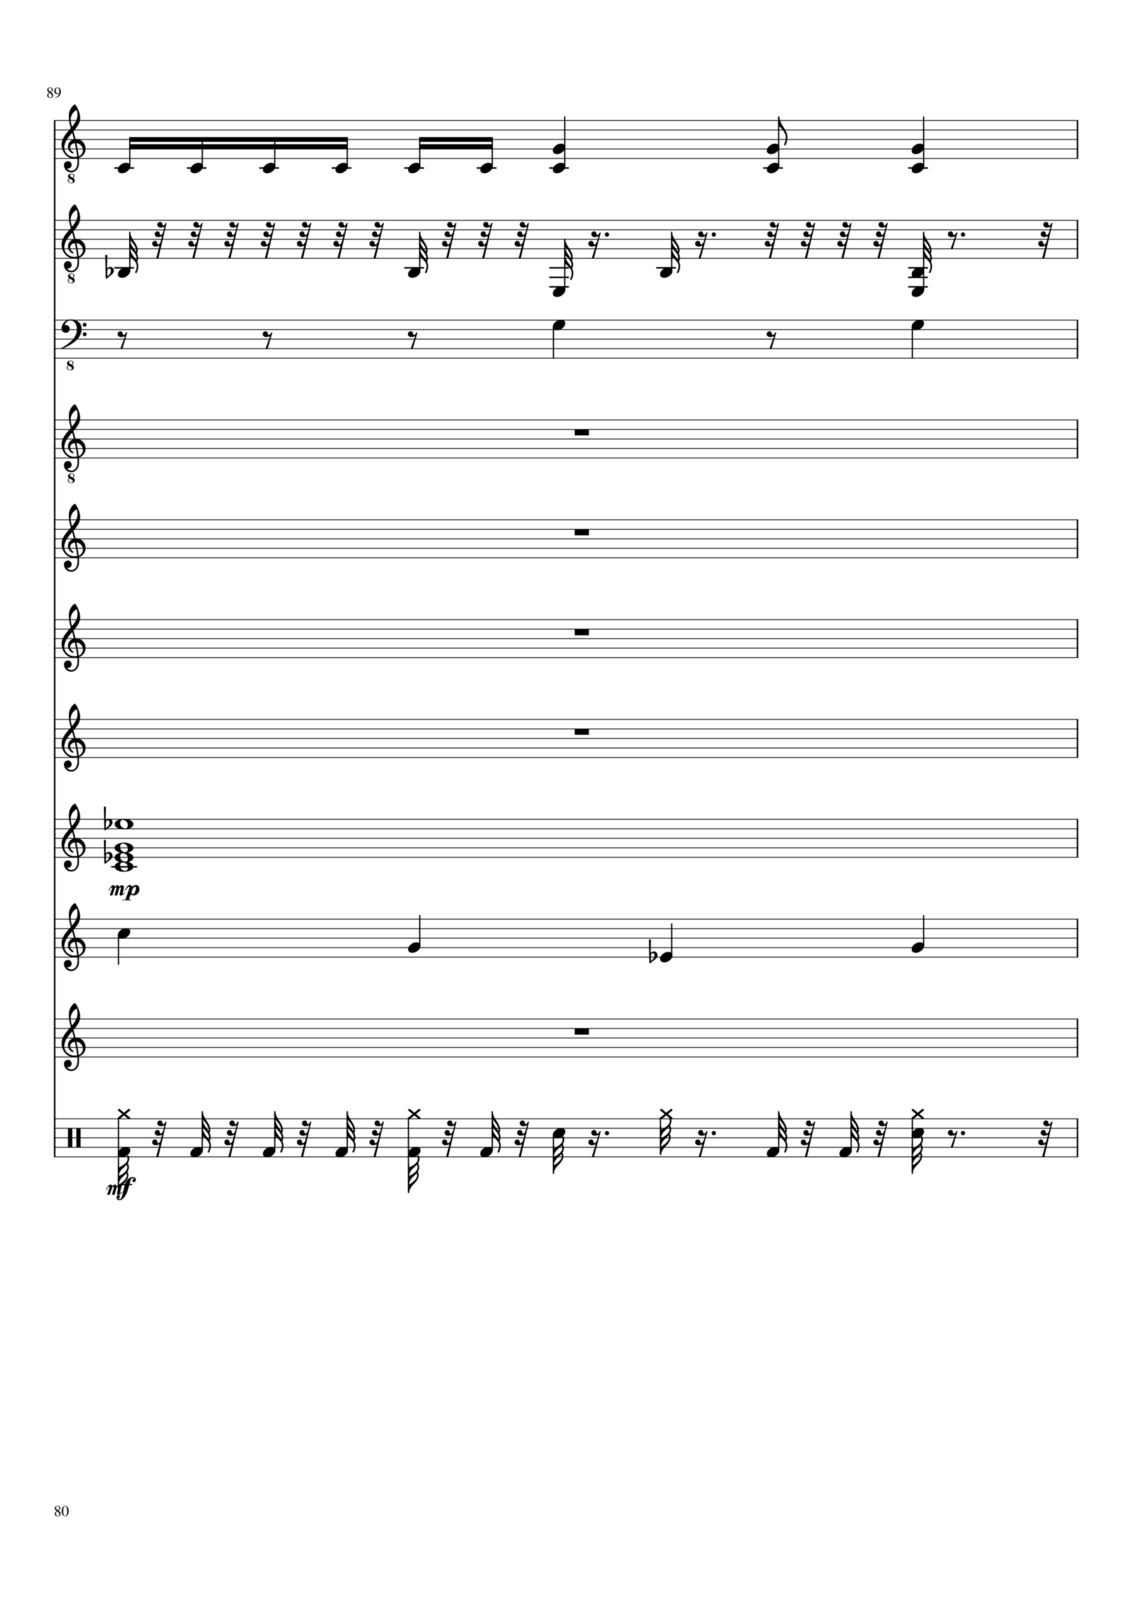 Belyiy sokol slide, Image 80